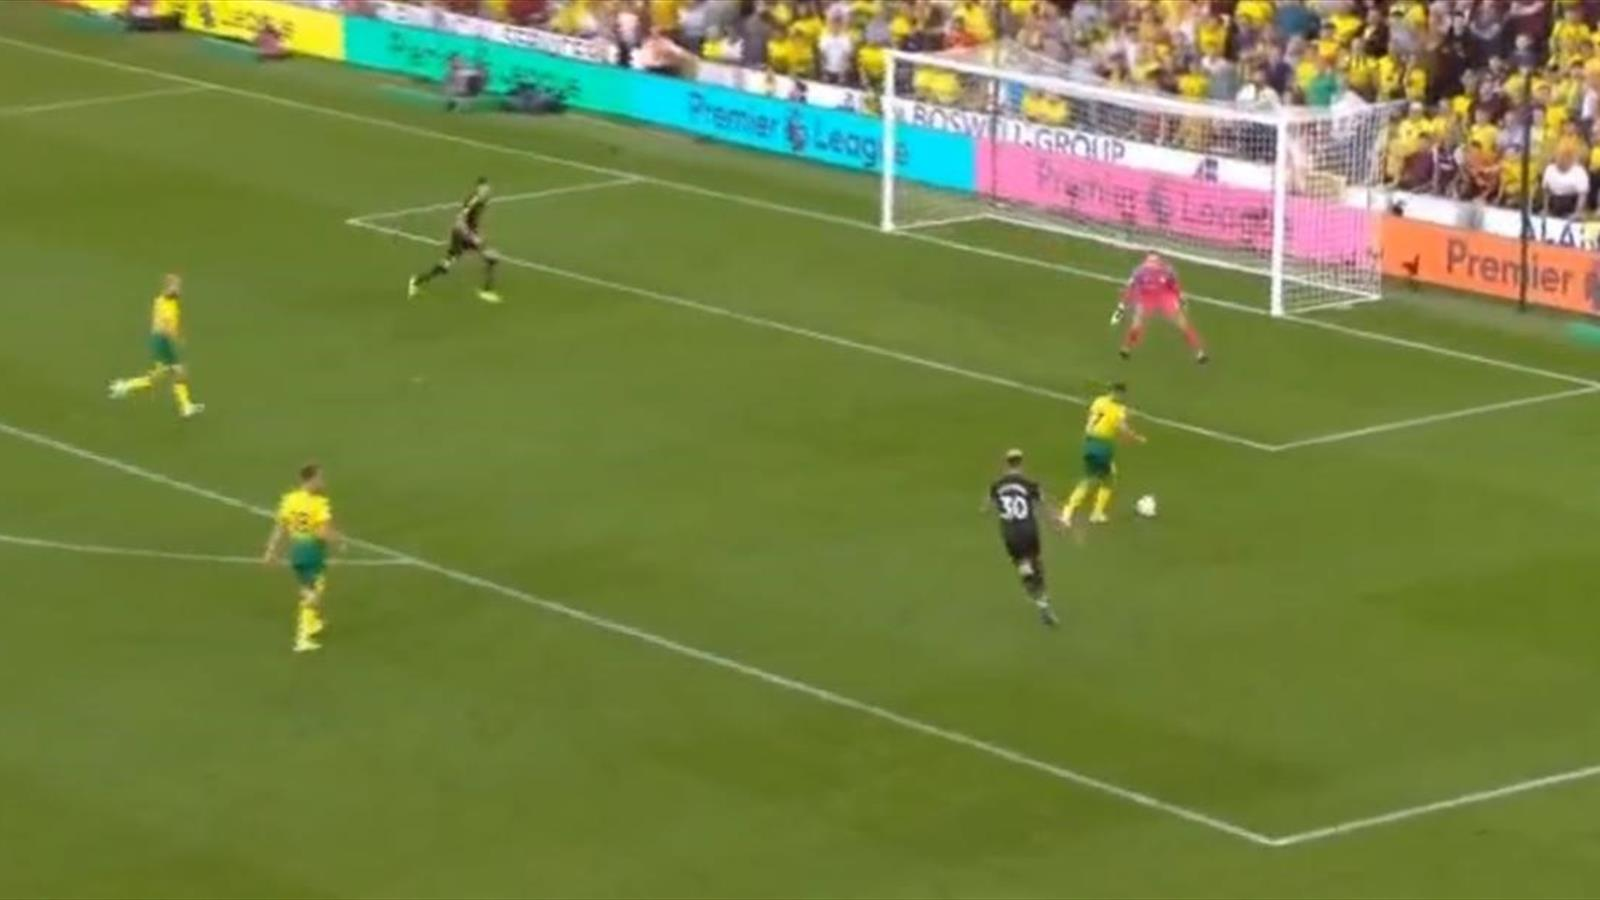 Видео голов из матча «Норвич» – «Манчестер Сити» – чемпионат Англии